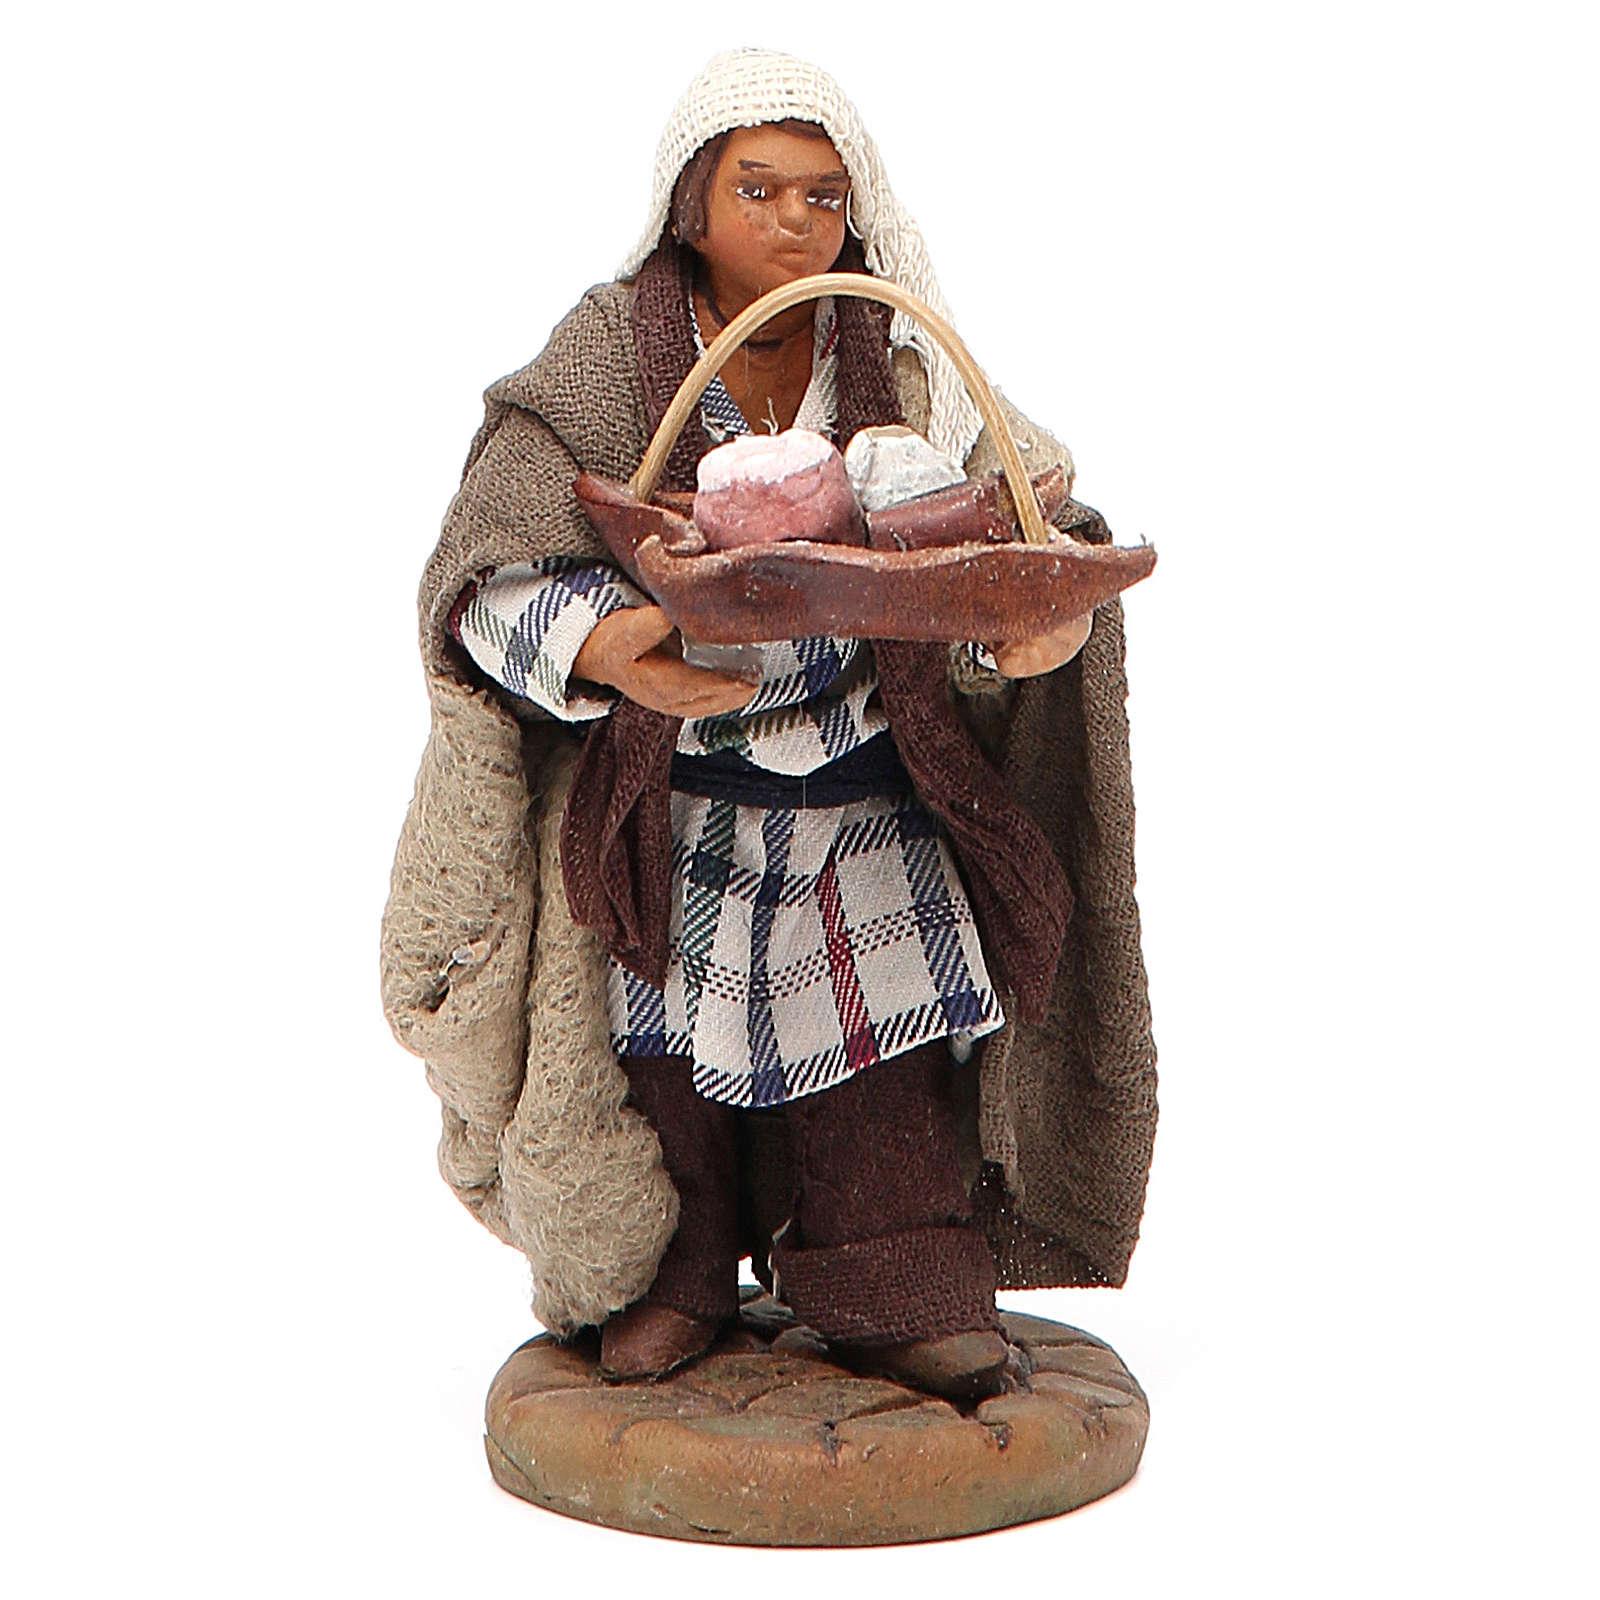 Man holding basket of cured meats, Neapolitan nativity figurine 10cm 4